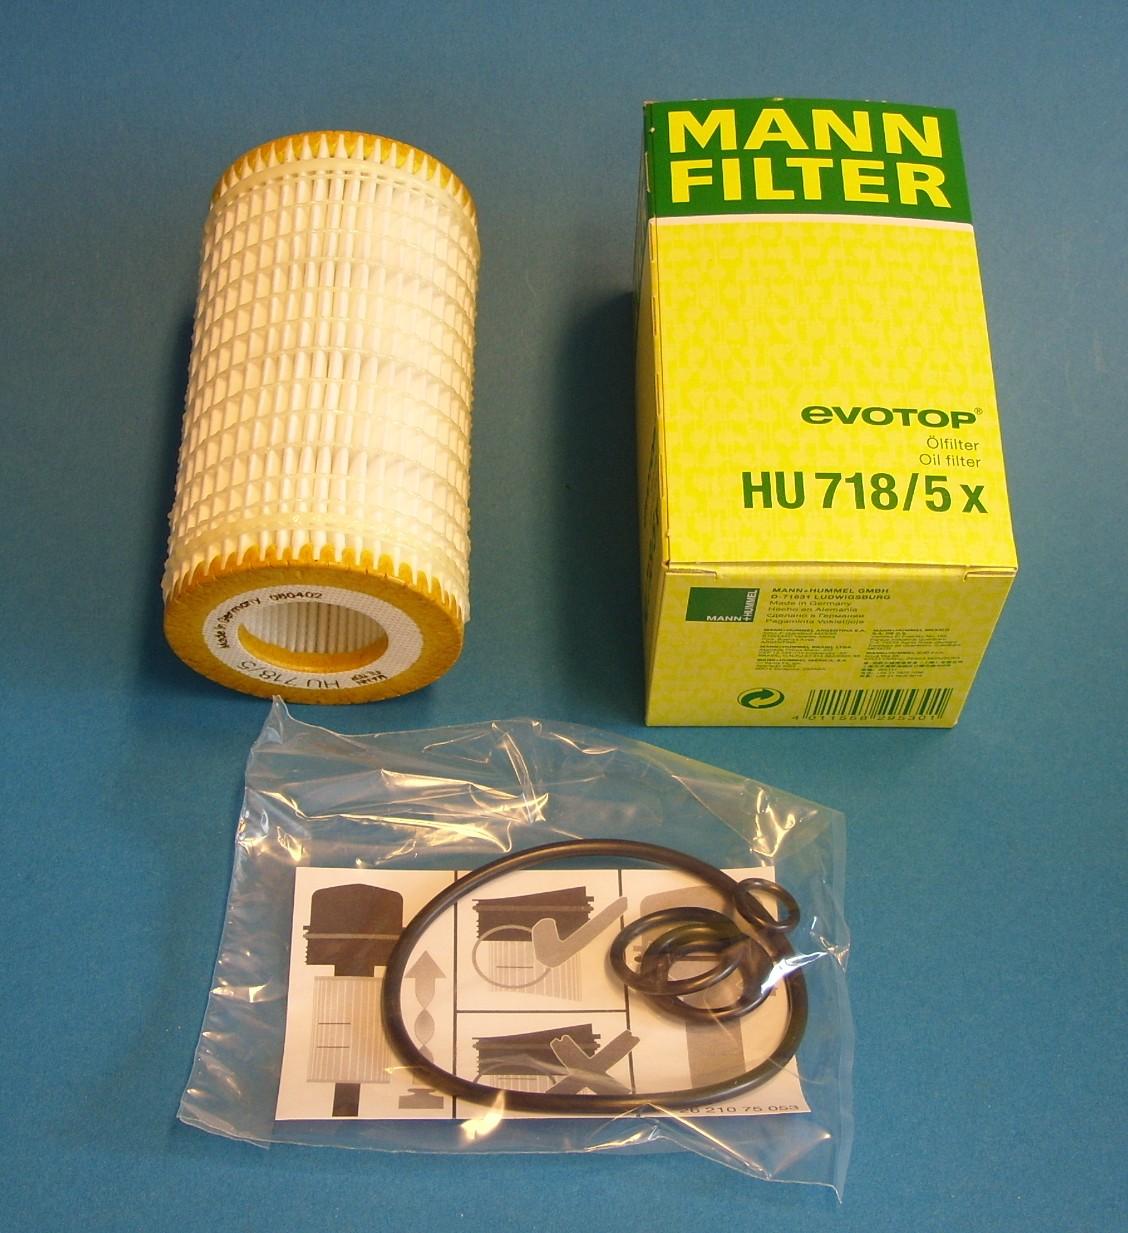 Chrysler Crossfire Srt 6 2004: MANN + Hummel HU 718/5X HU718/5X